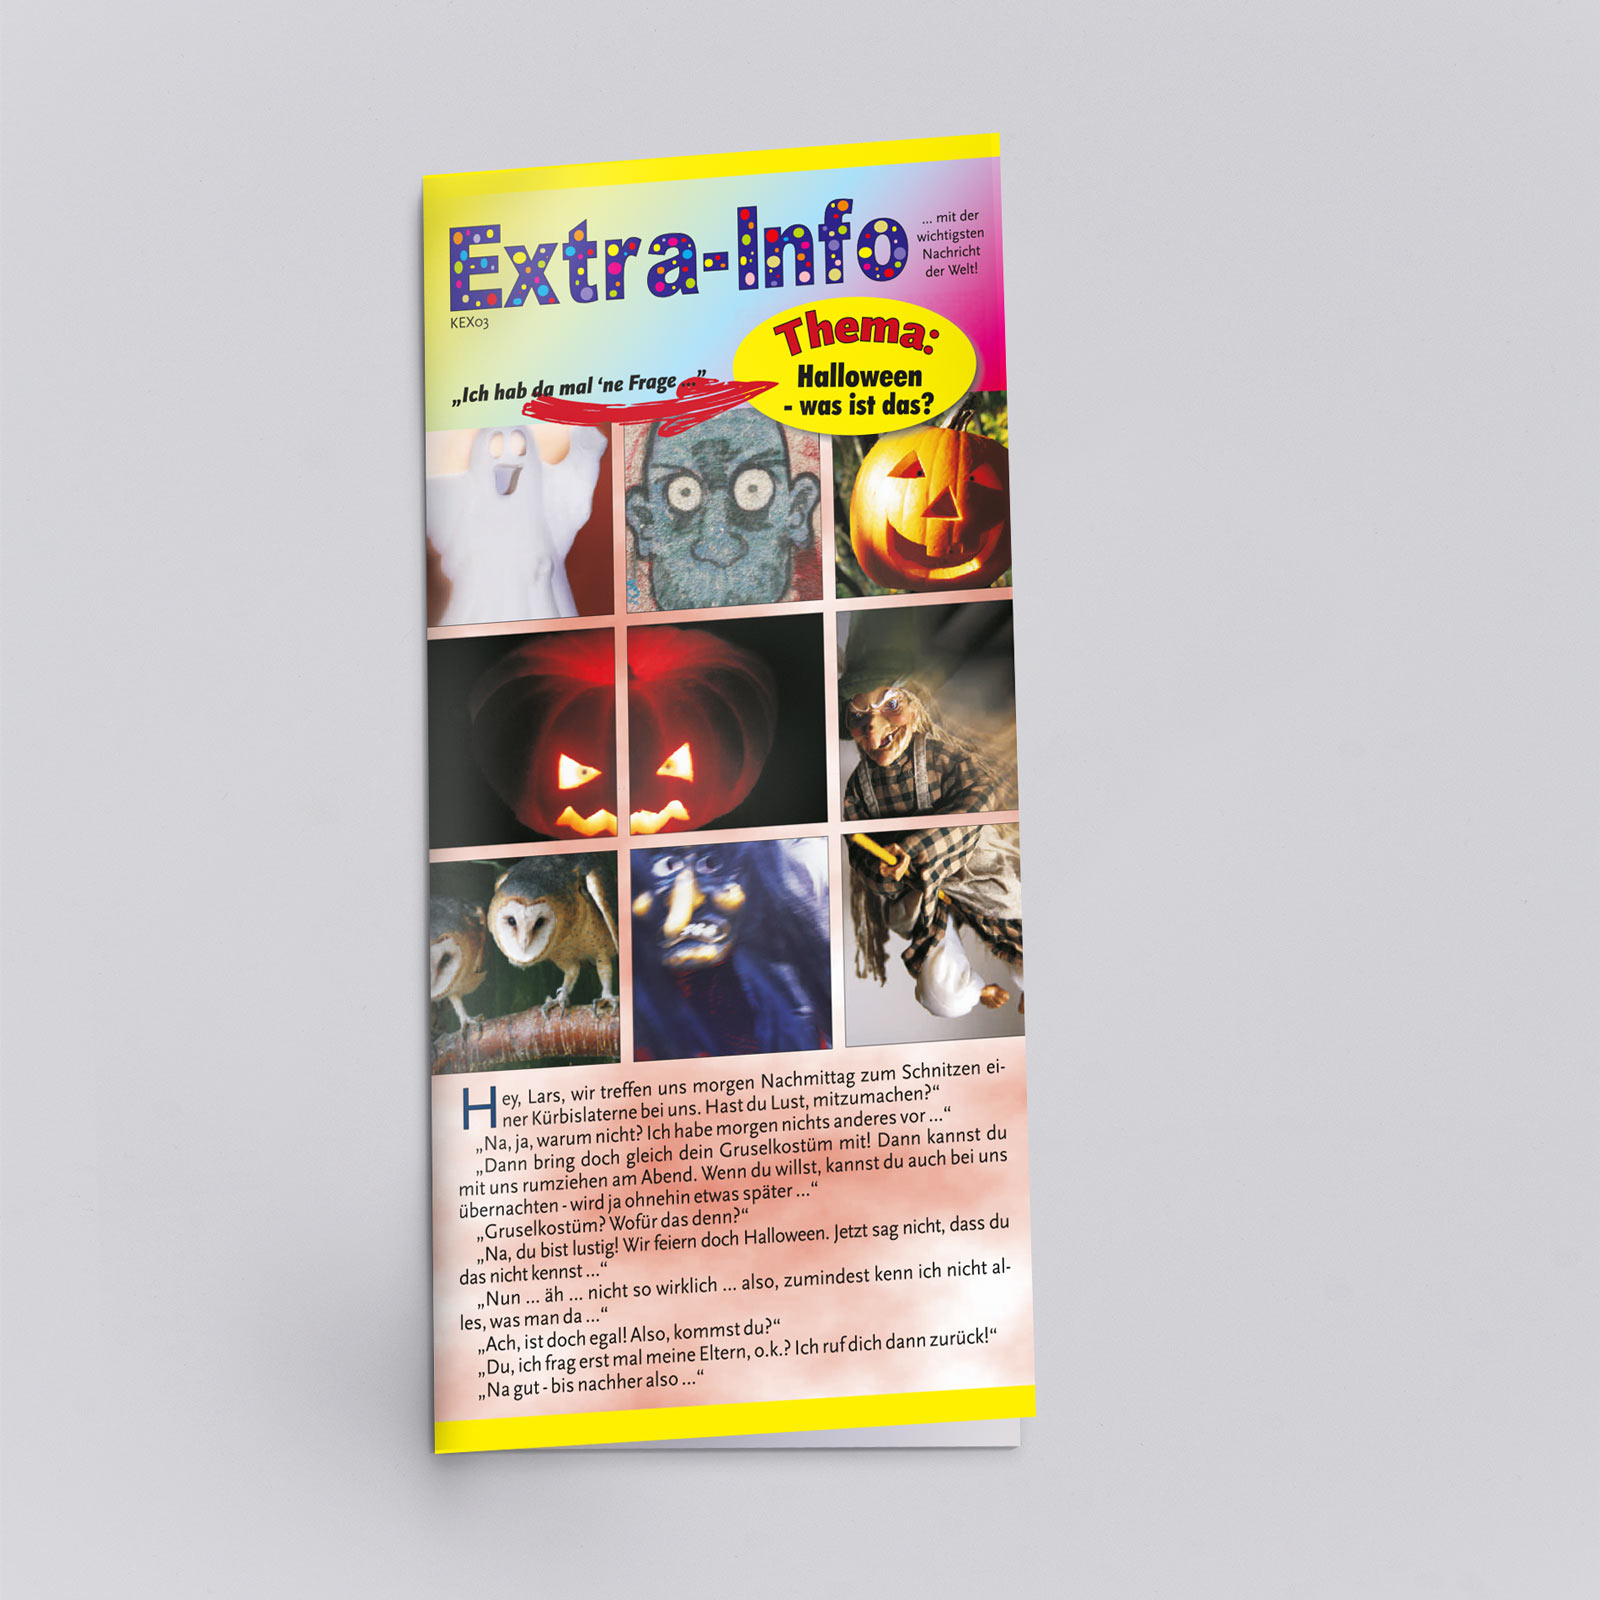 Extra-Info zum Thema Halloween